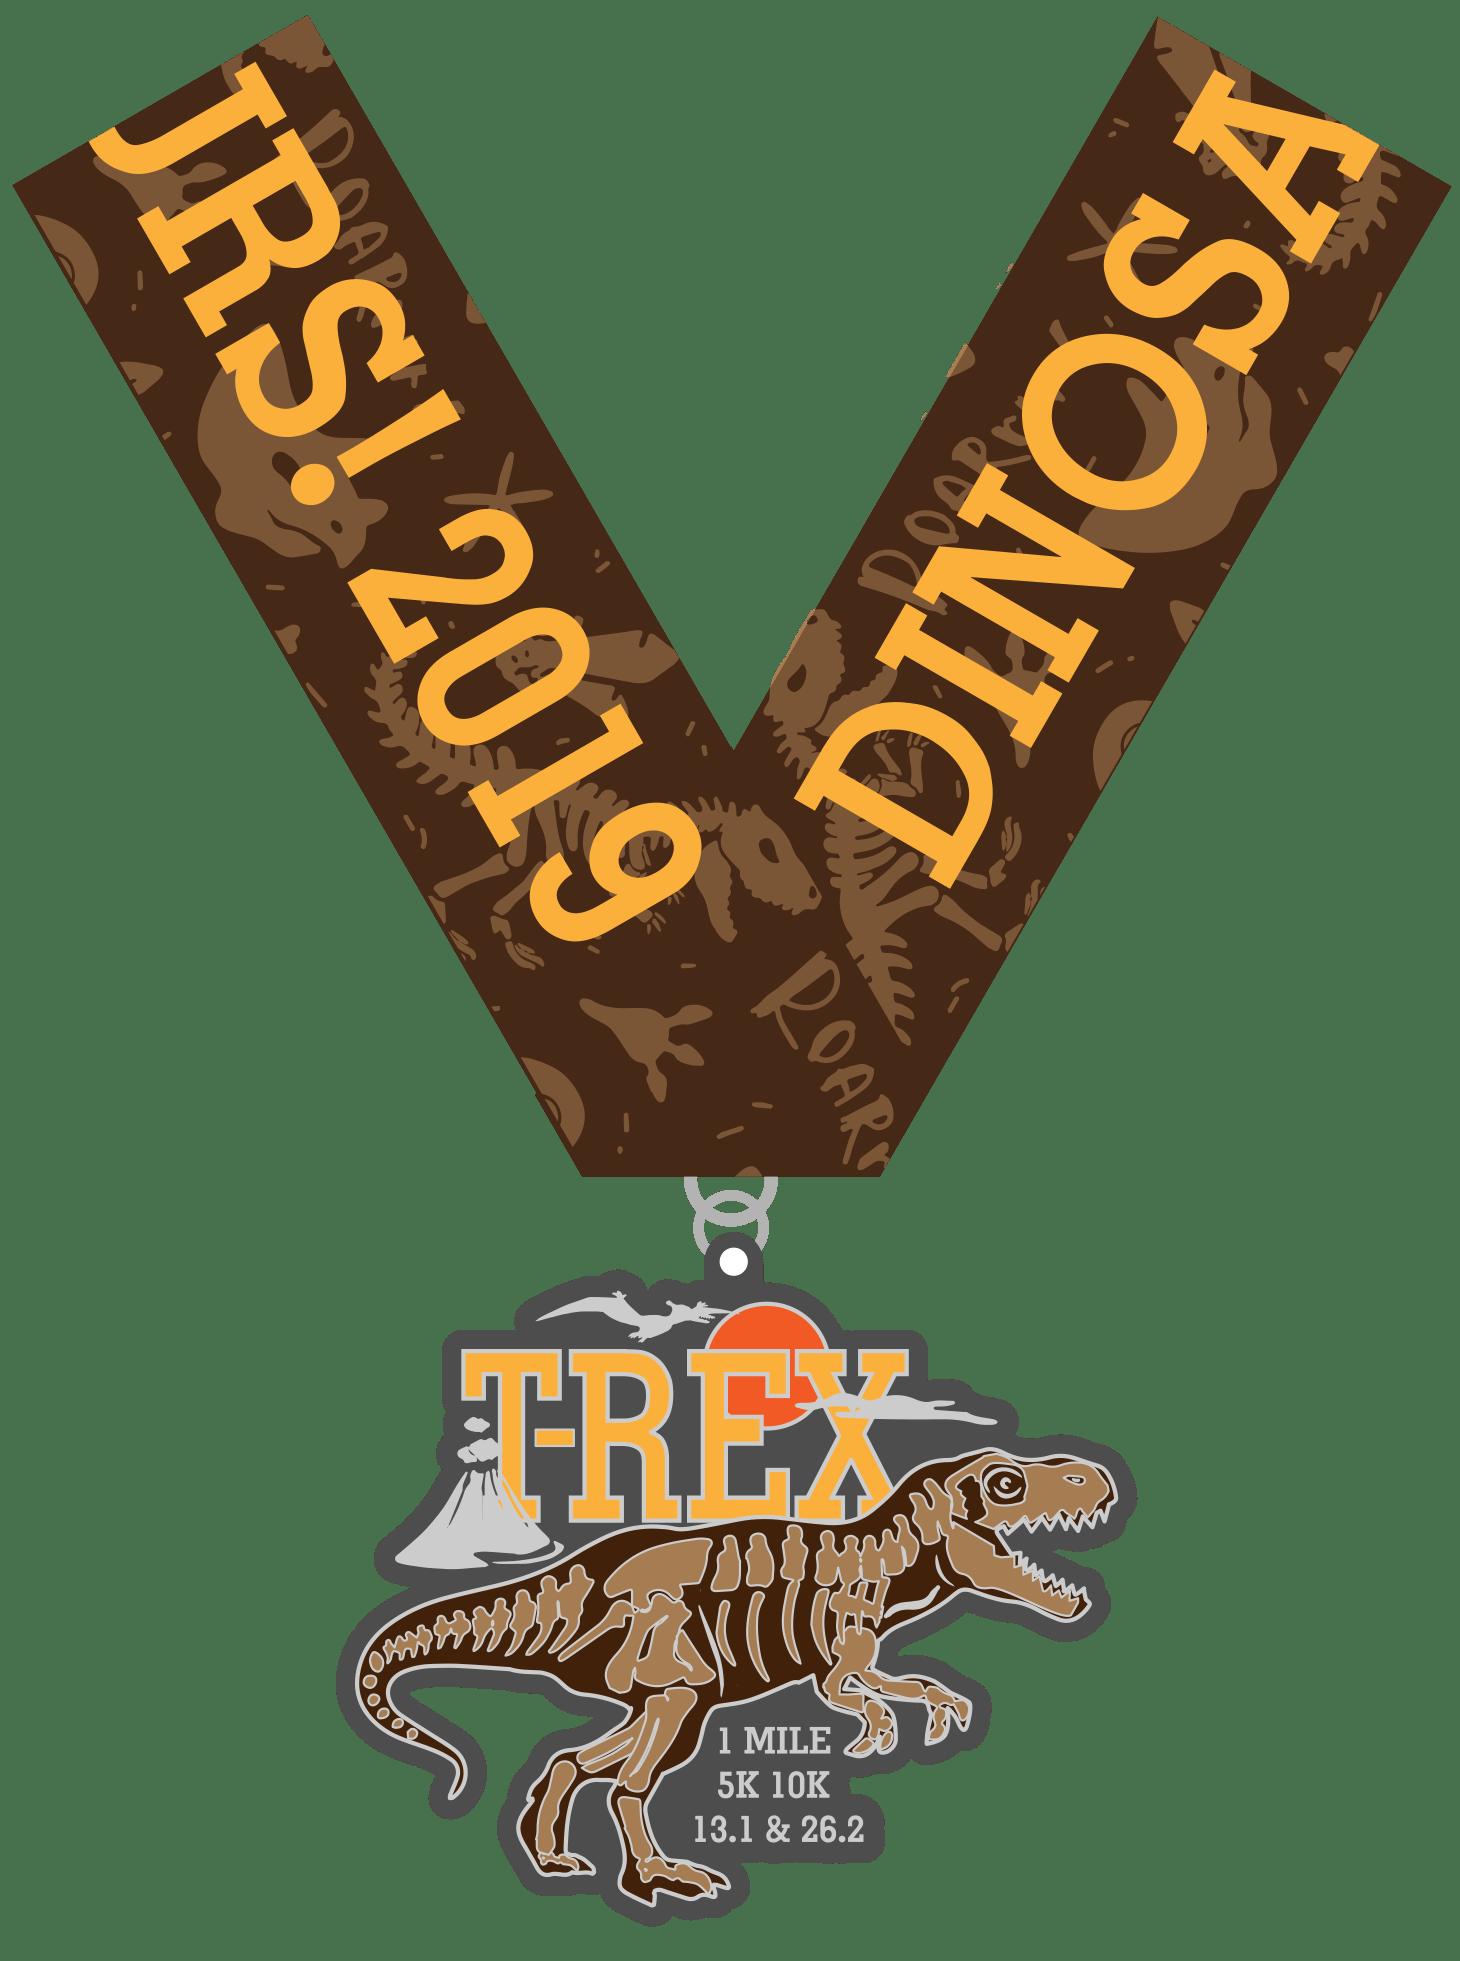 2019 Dinosaur! T-Rex 1M, 5K, 10K, 13.1, 26.2- Phoenix